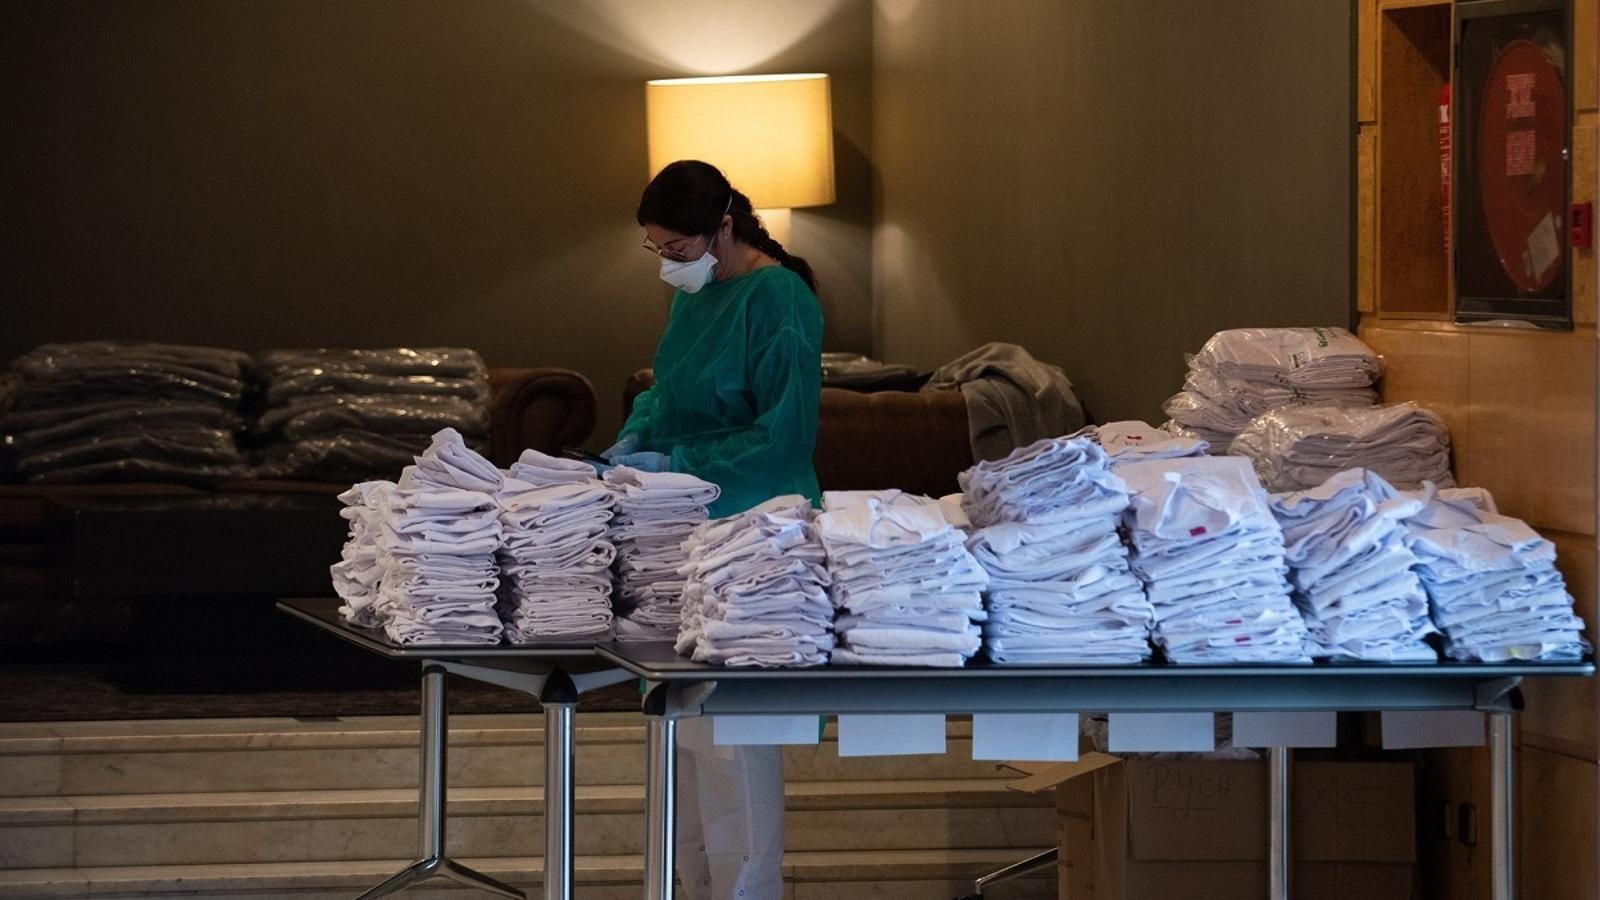 Una professional sanitària, treballant per habilitar l'hotel Catalonia Plaza de Barcelona